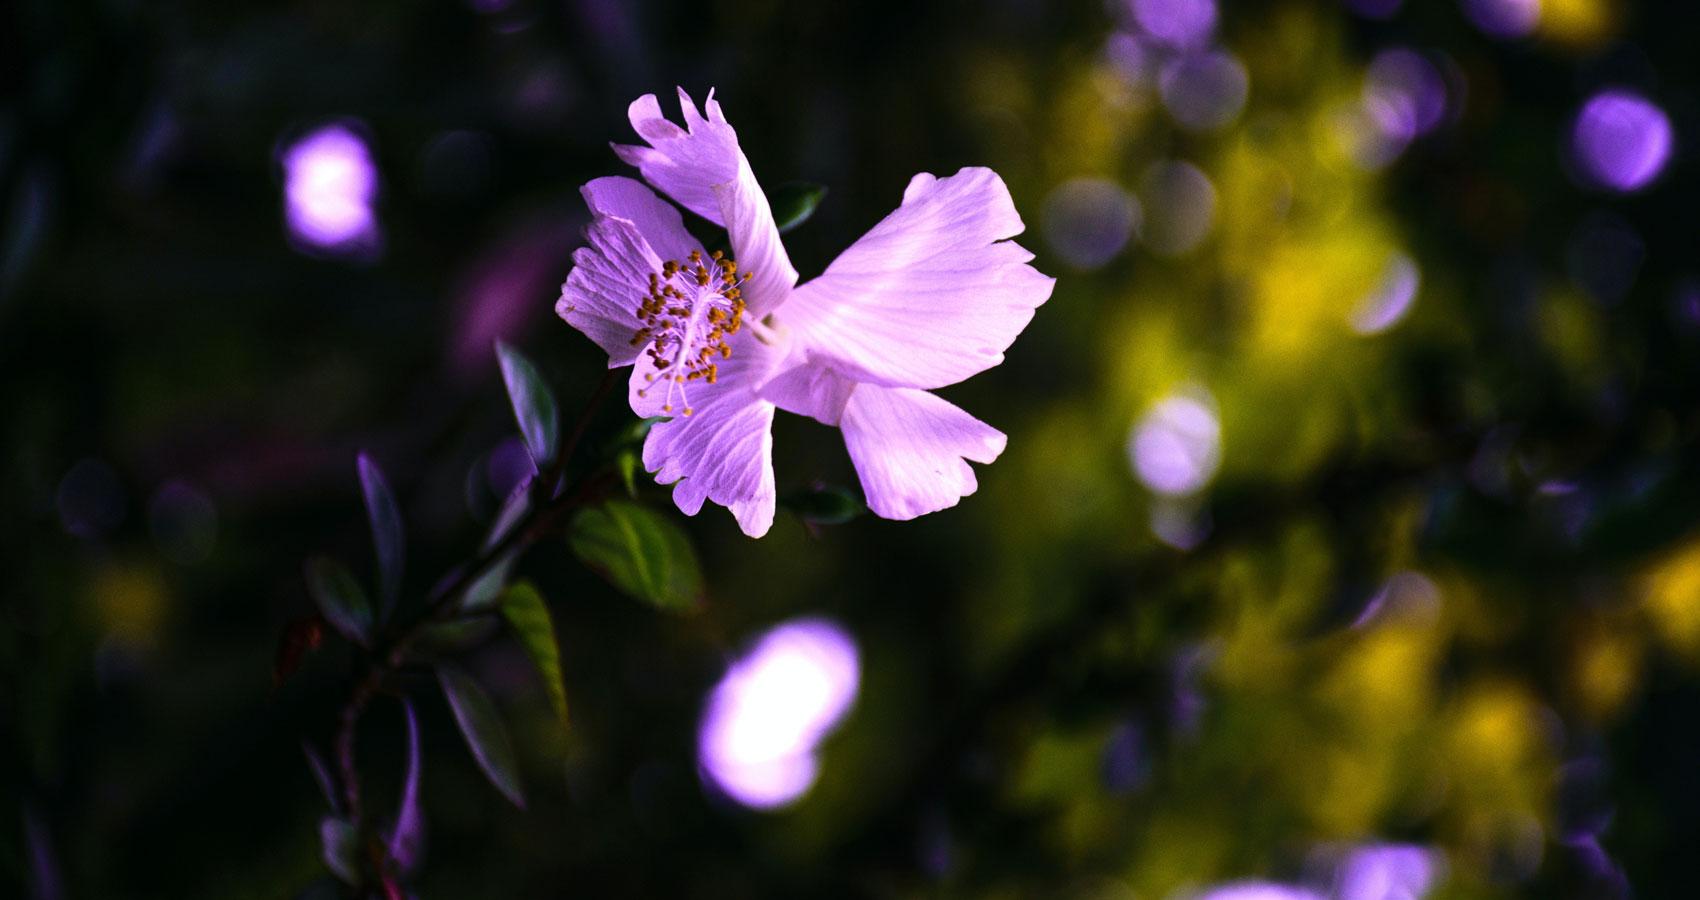 The Gardener's Flowers, a poem by Nattie O'Sheggzy at Spillwords.com